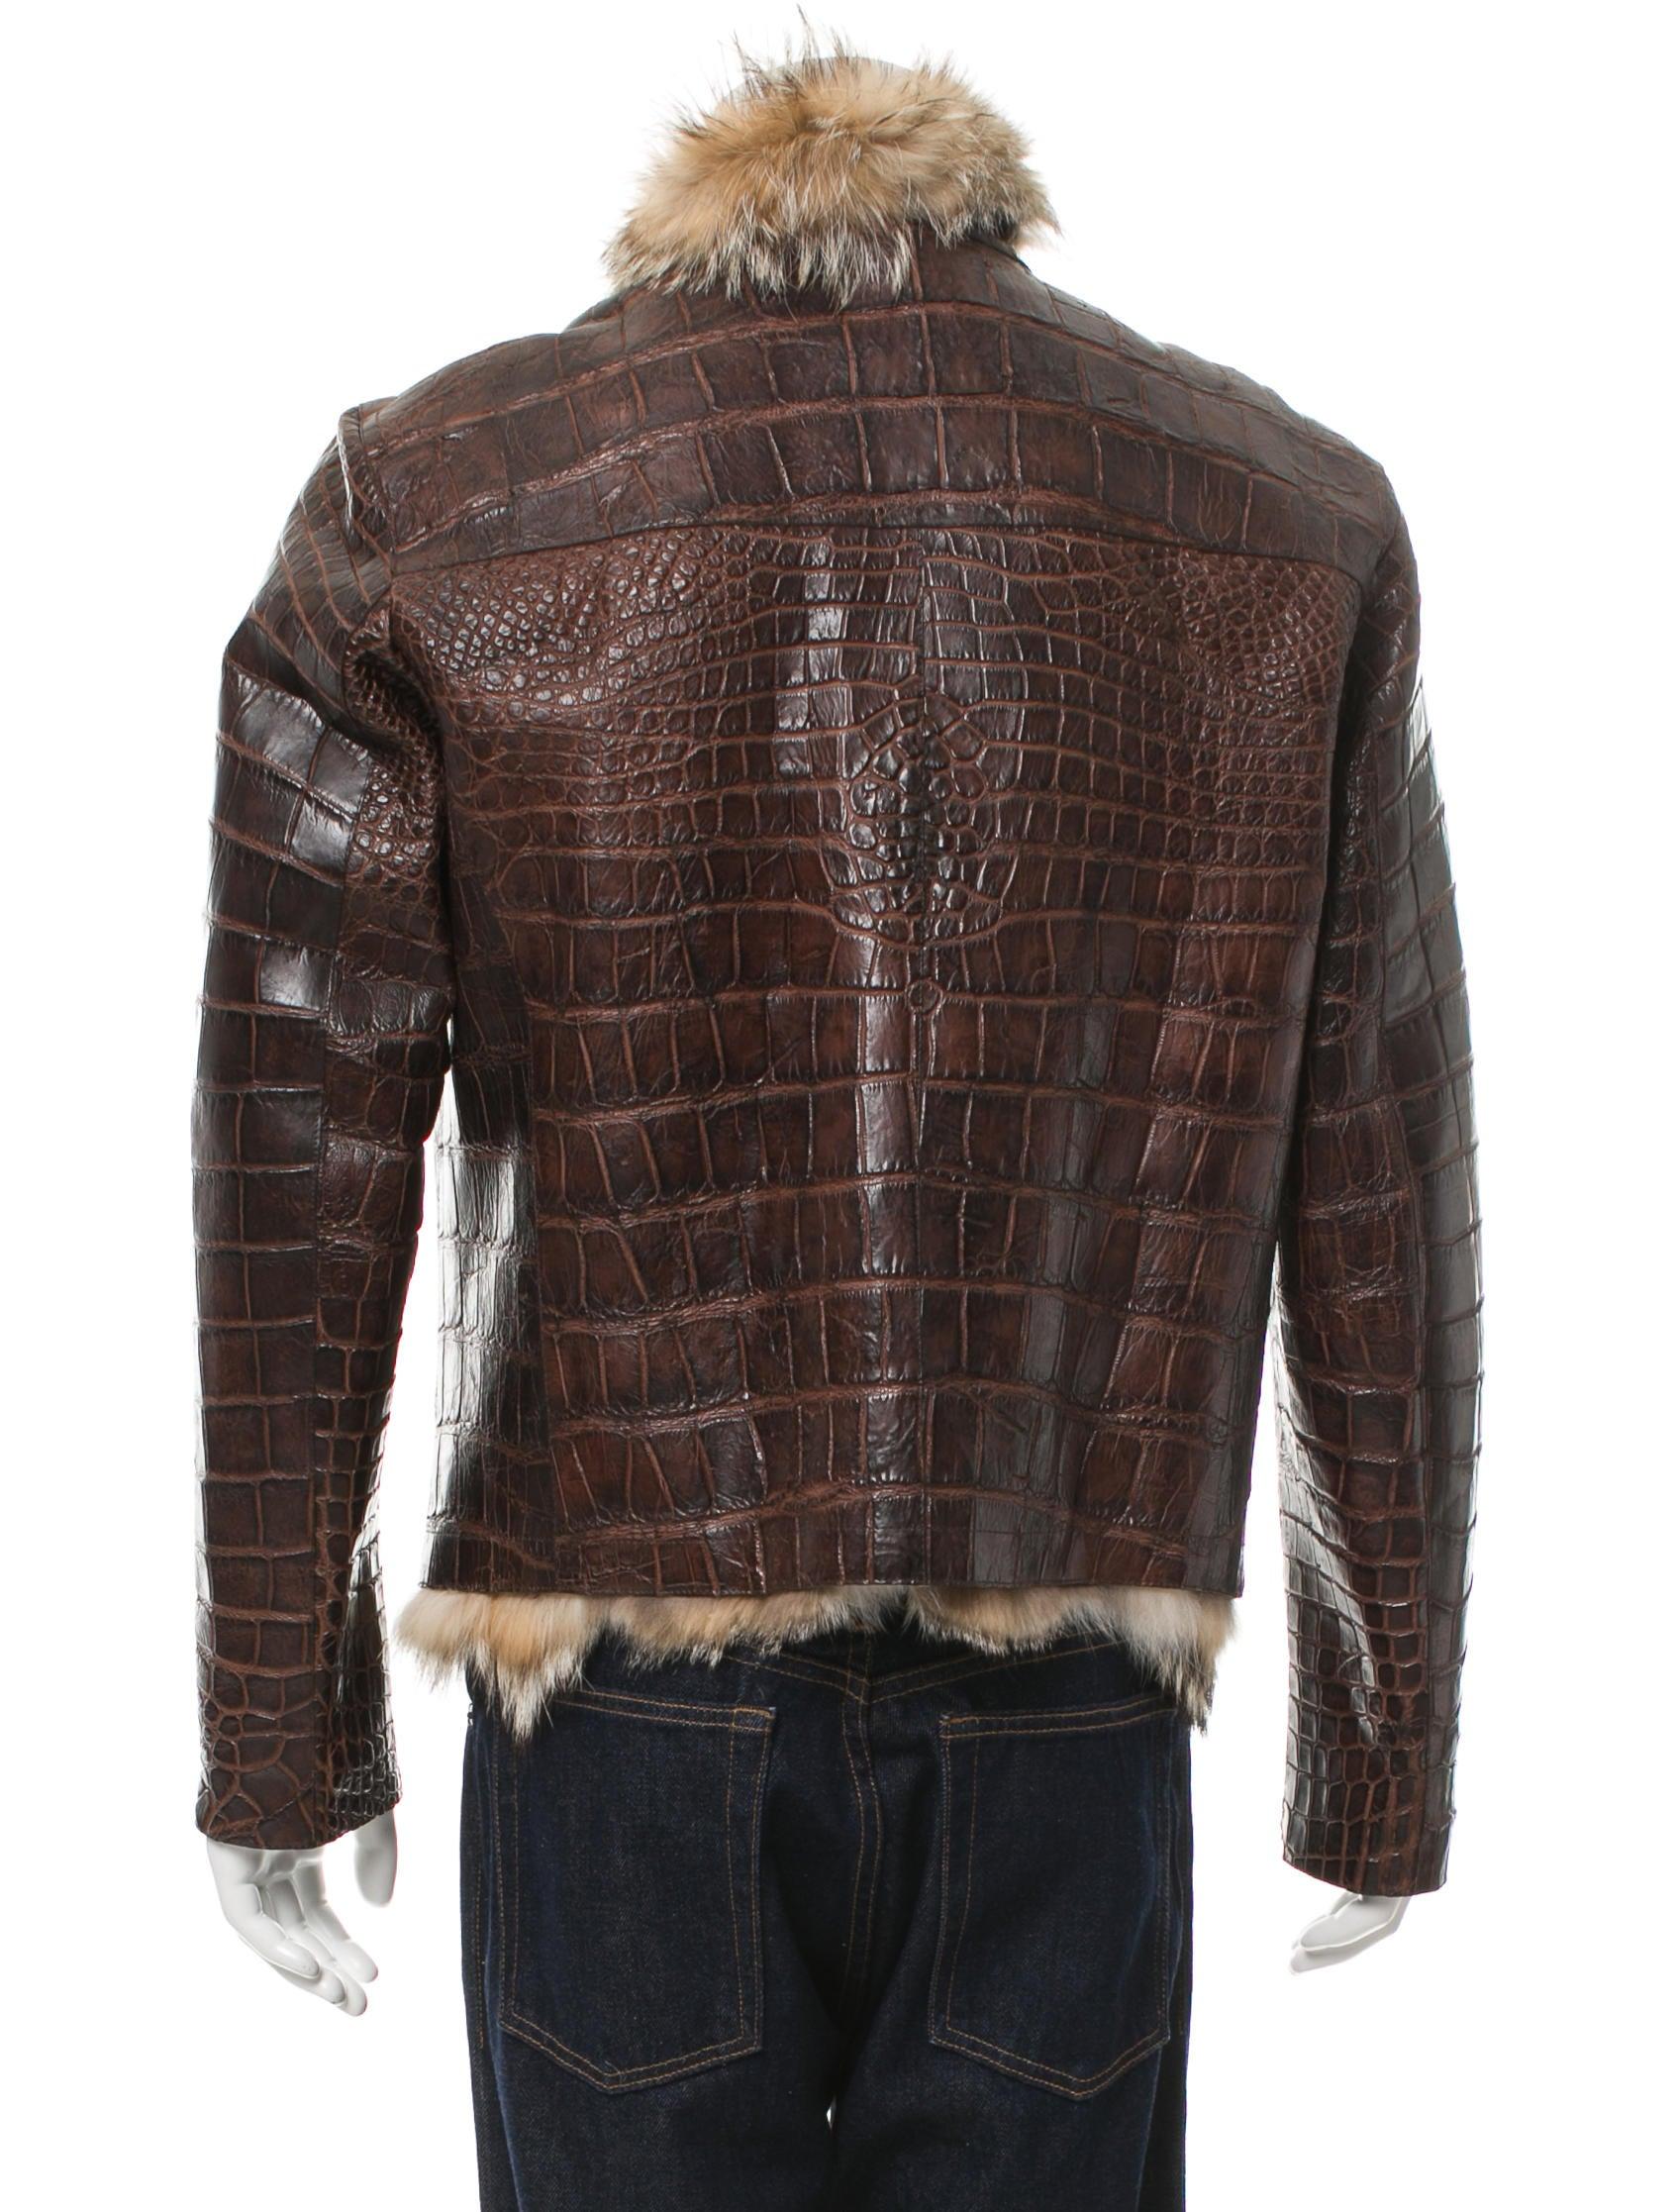 Crocodile Leather Jacket Company Cairoamani Com